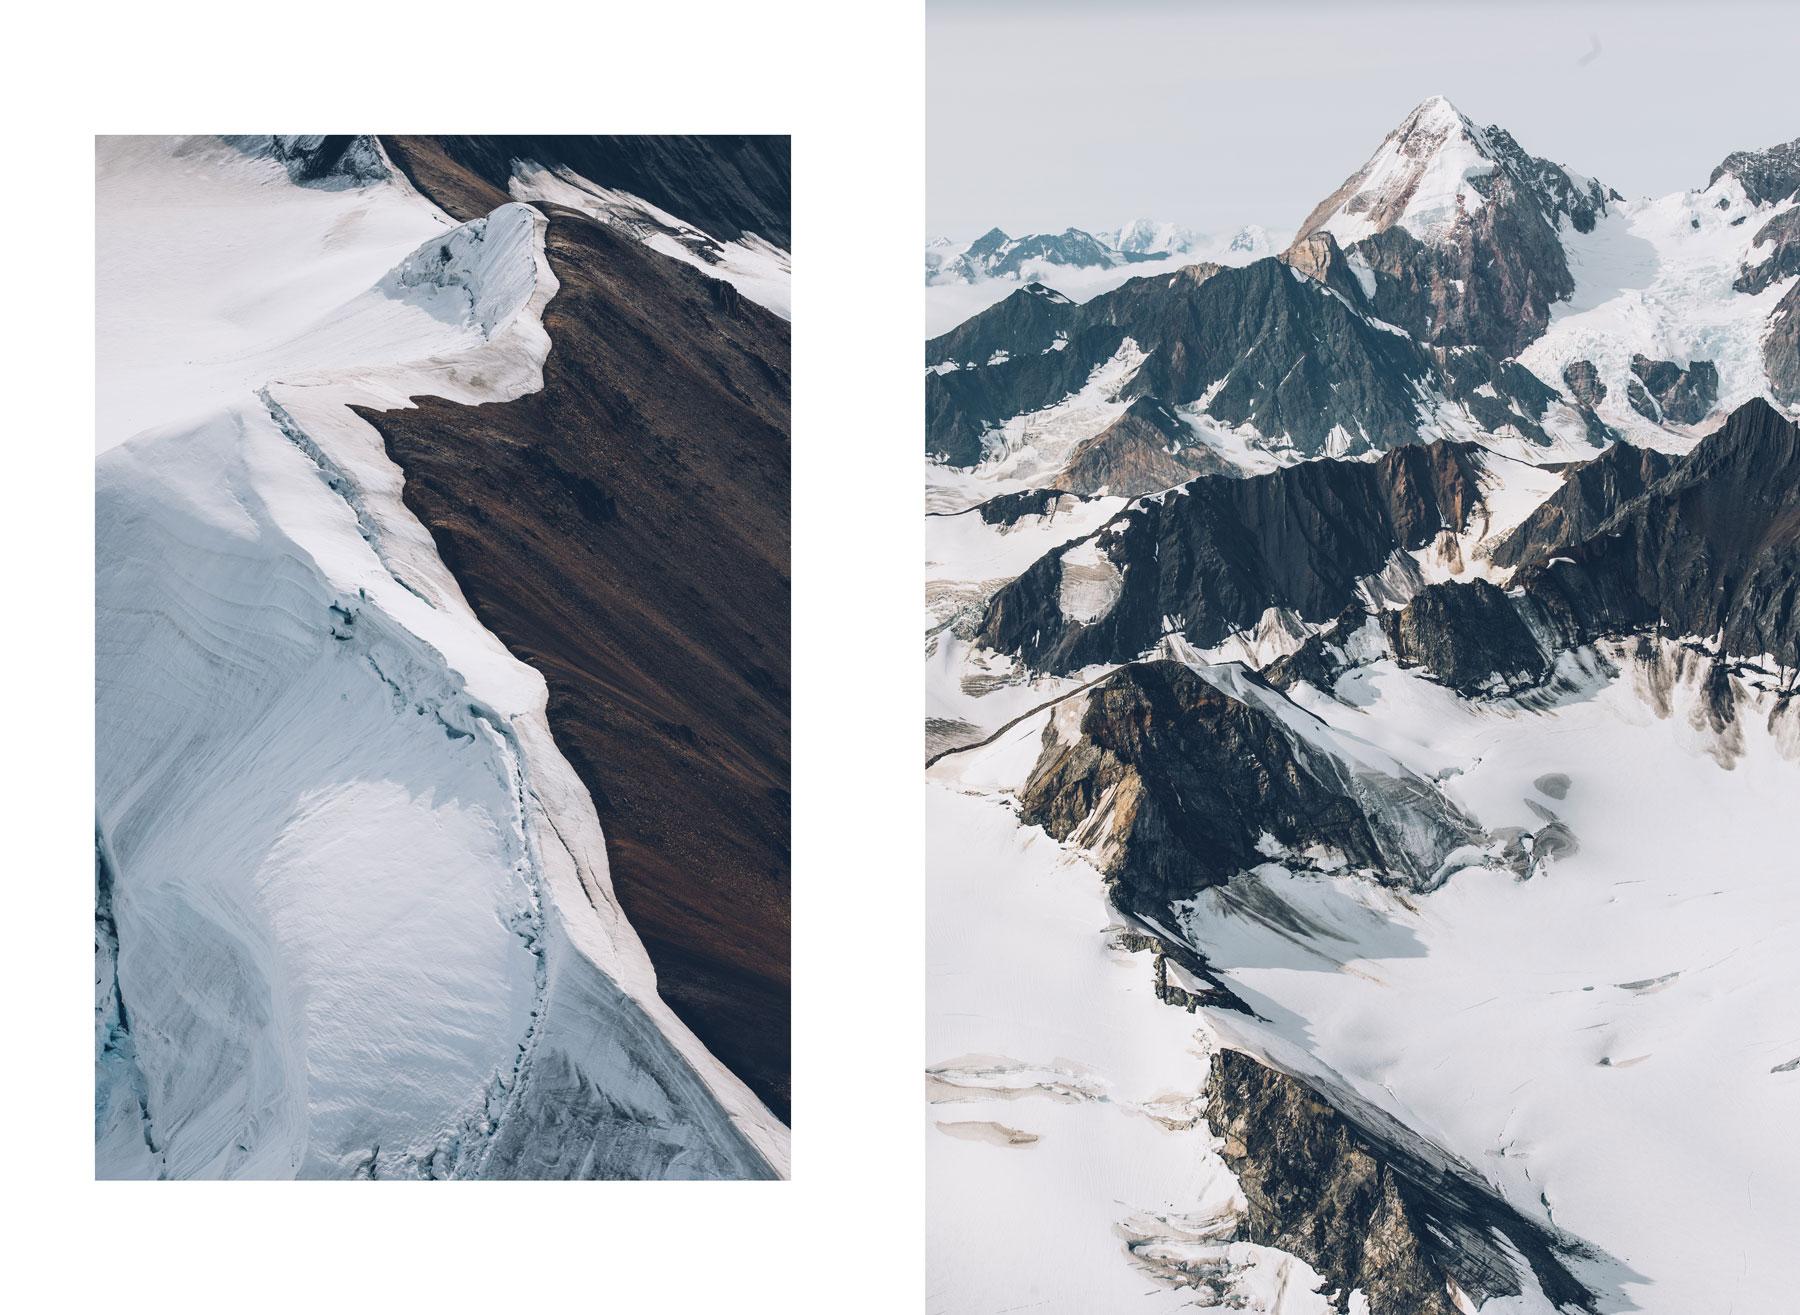 Montagnes du Yukon, Canada